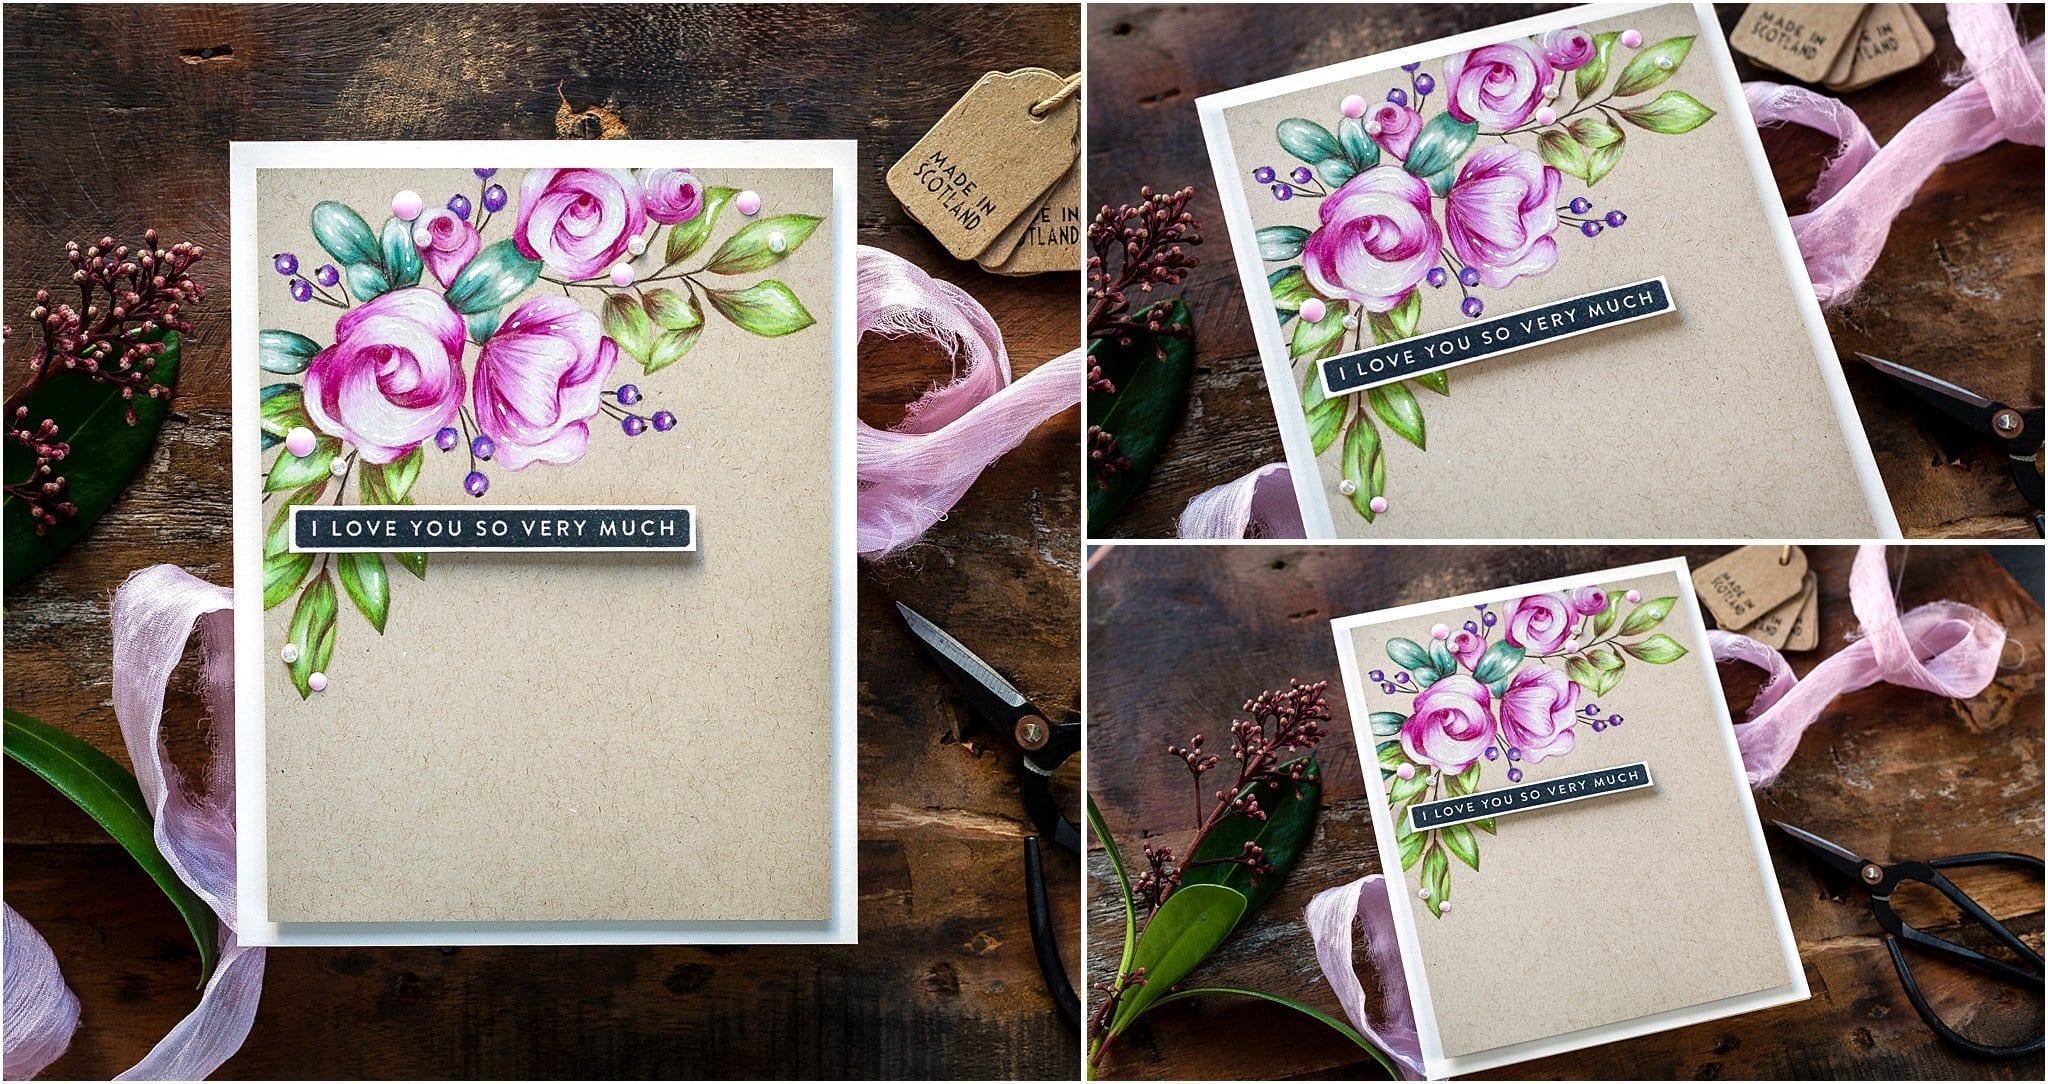 Video tutorial pencil colouring flowers on kraft card #handmadecards #debbyhughes #cardmaking #cardmakingideas #cardmakingtechniques  #cardmakingtutorials #handmadecardideas #handmadechristmas #simonsaysstamp